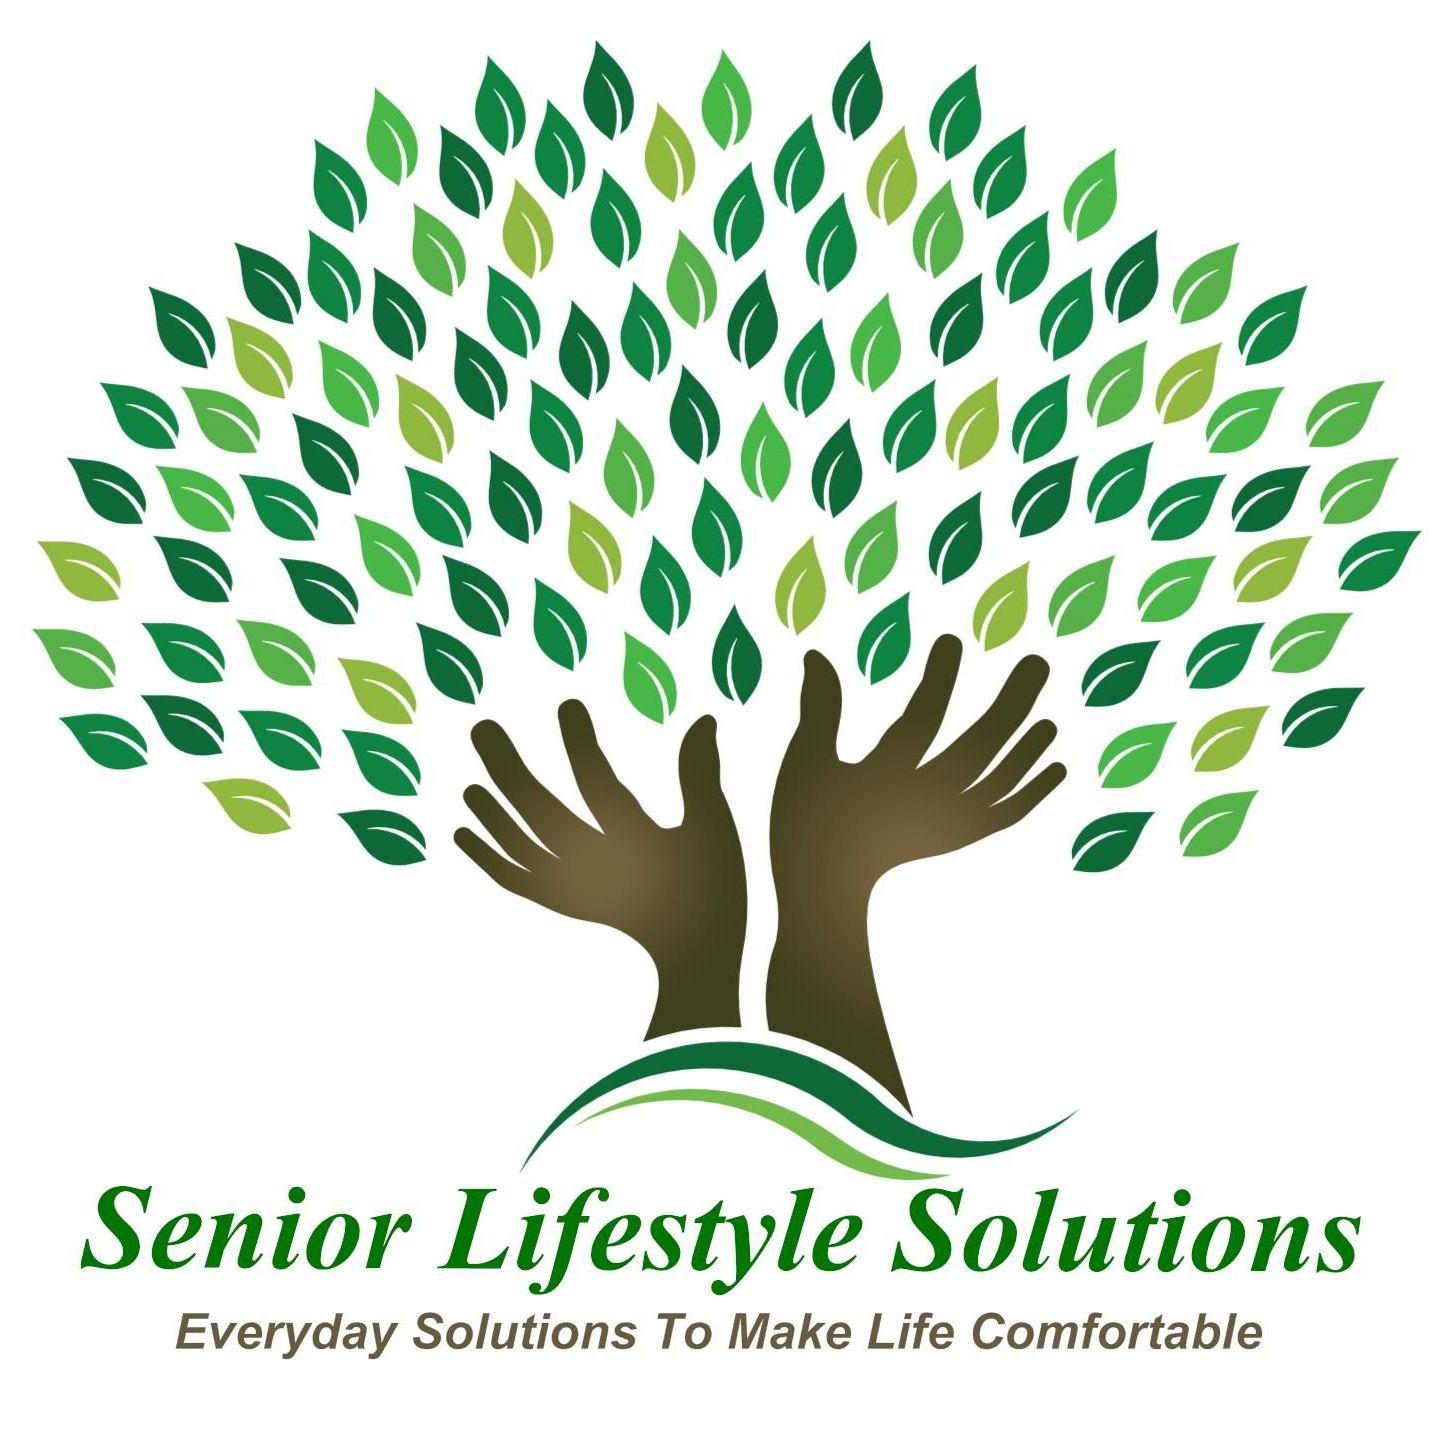 Senior Lifestyle Solutions, LLC